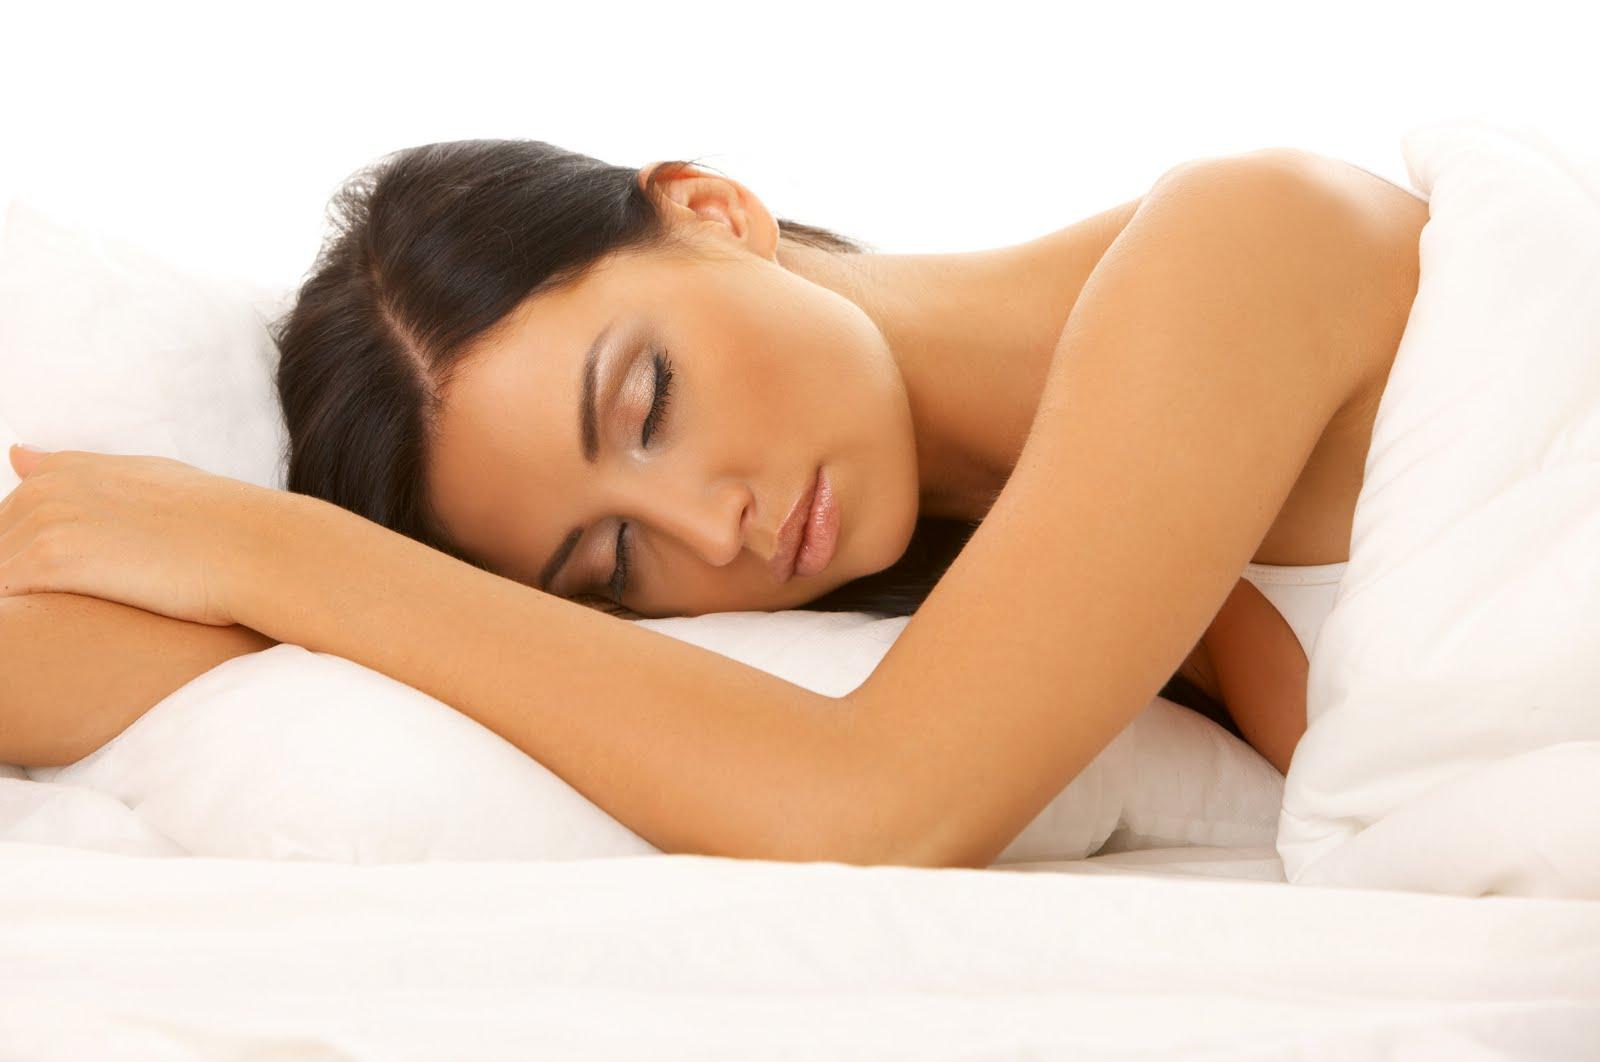 The main rules of healthy sleep